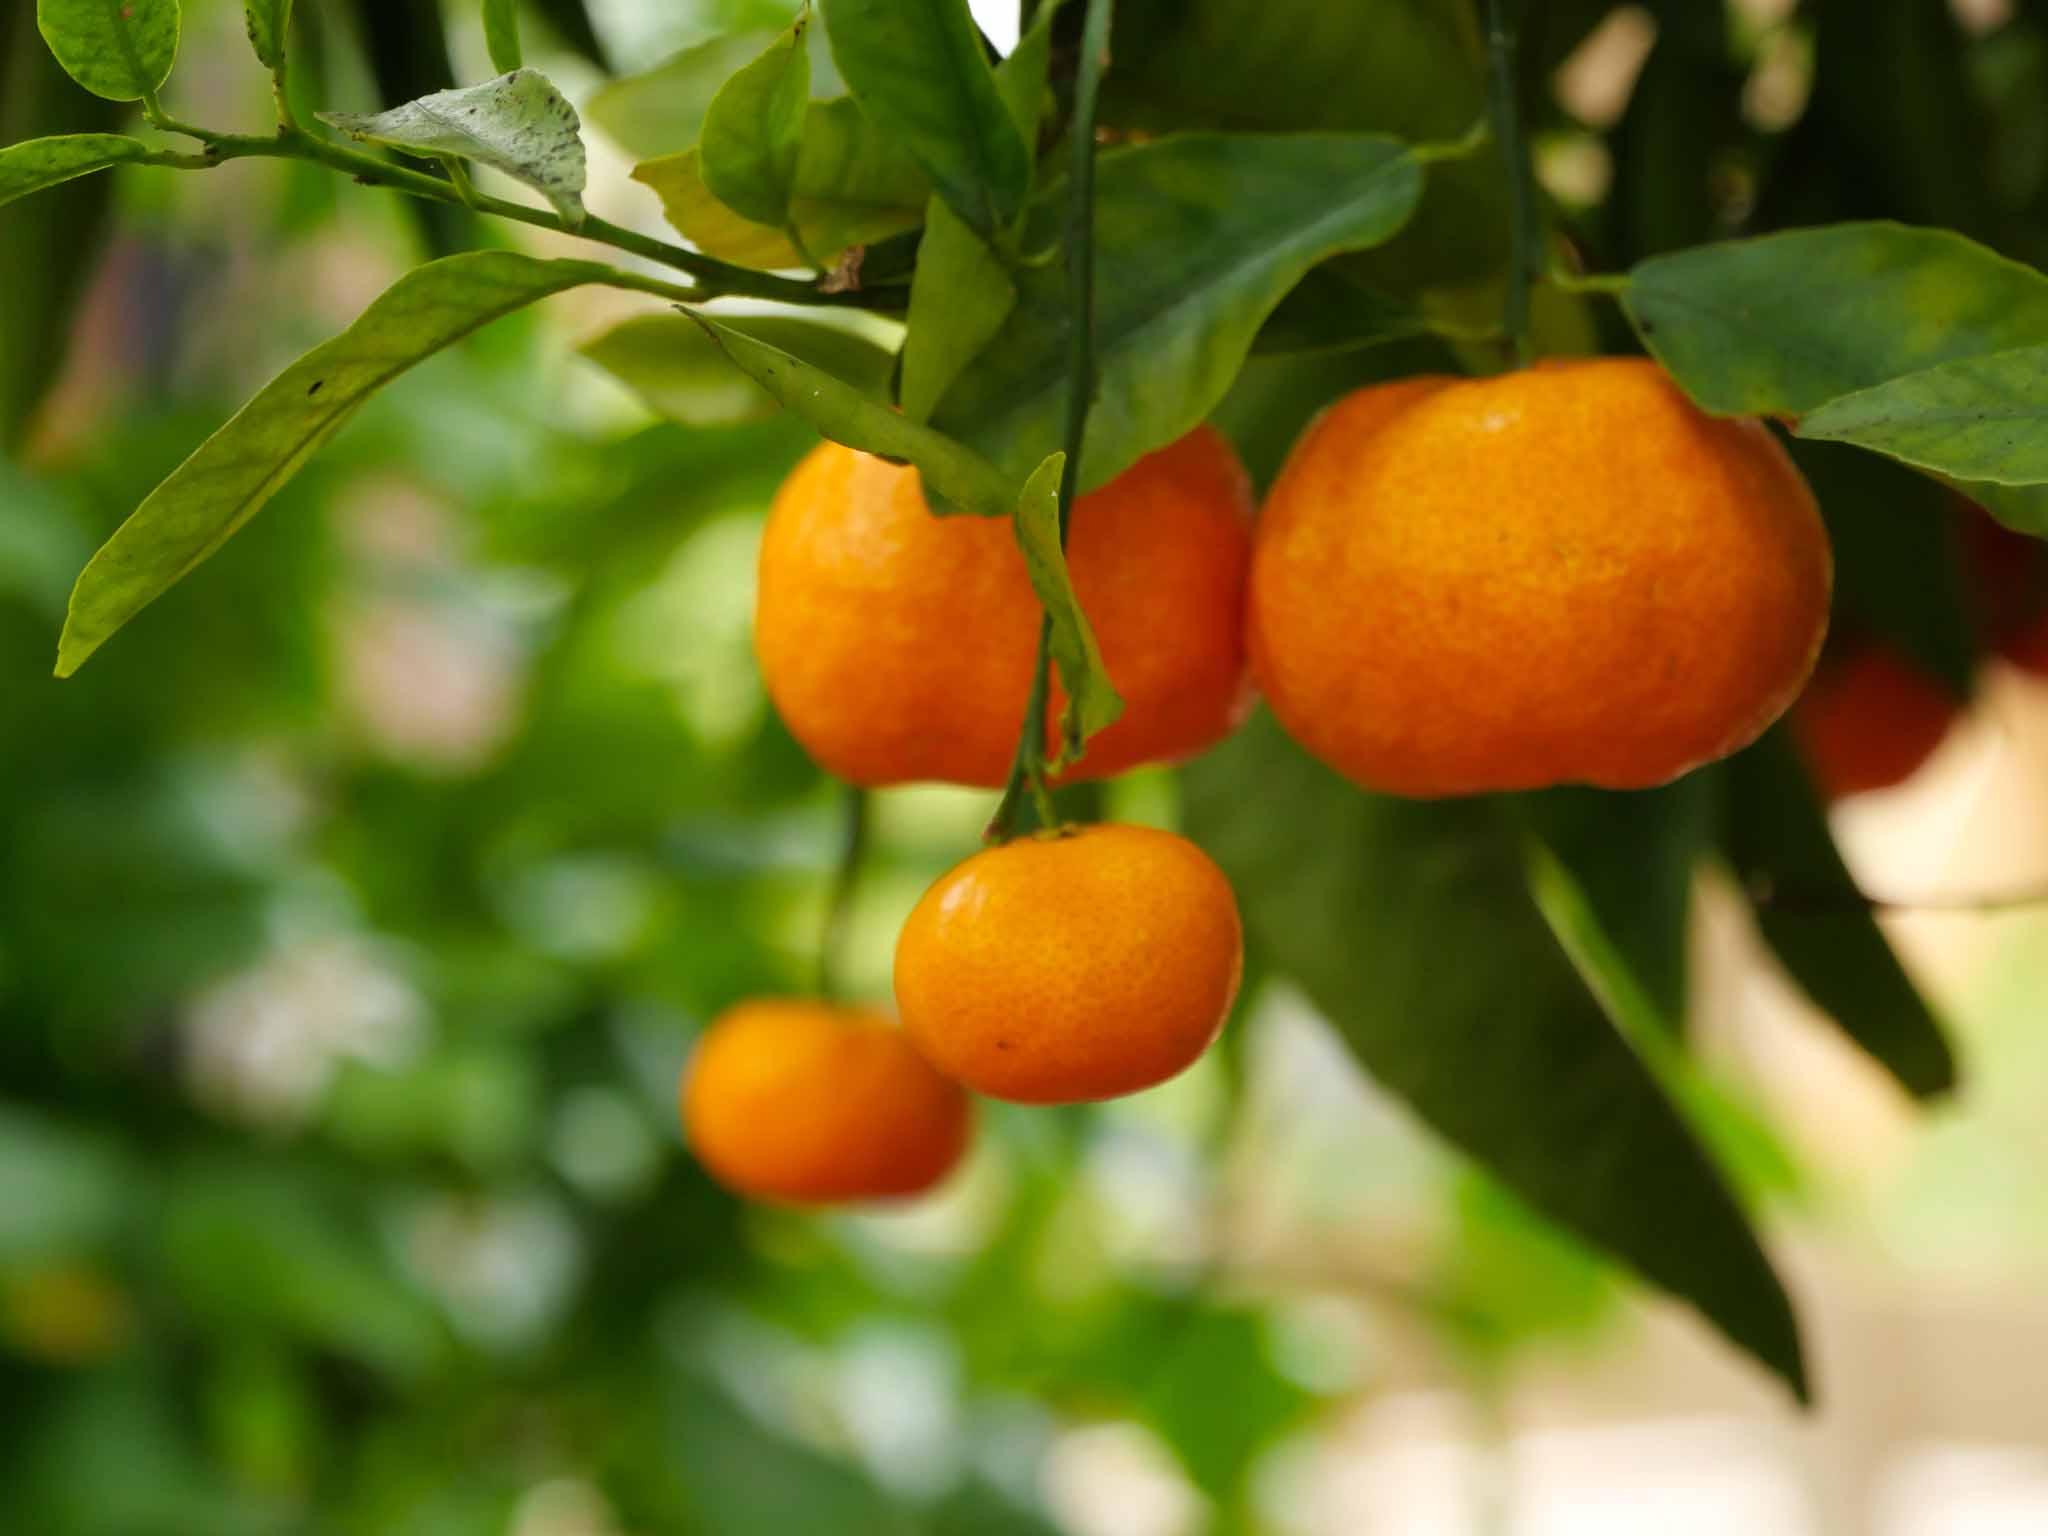 Plant agrume Morlaix